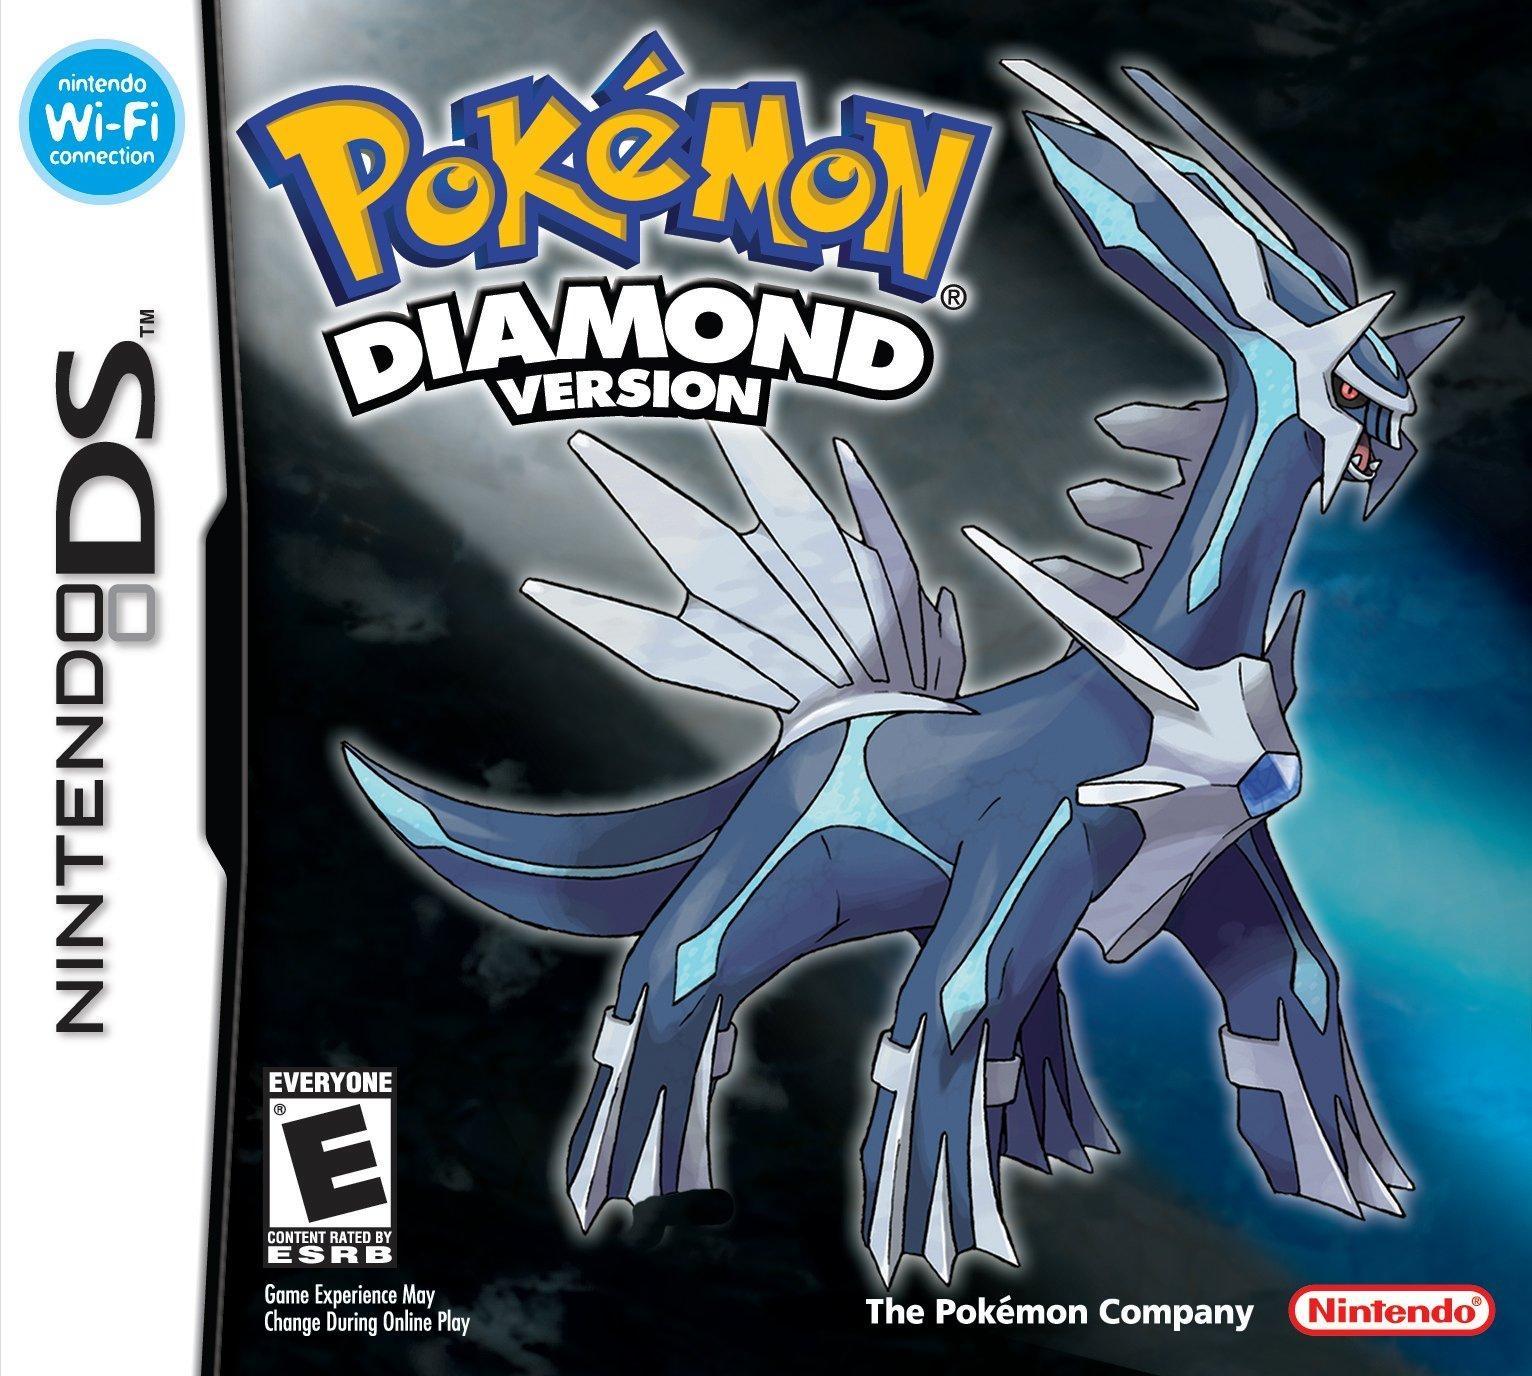 Pokemon Diamond Version/DS